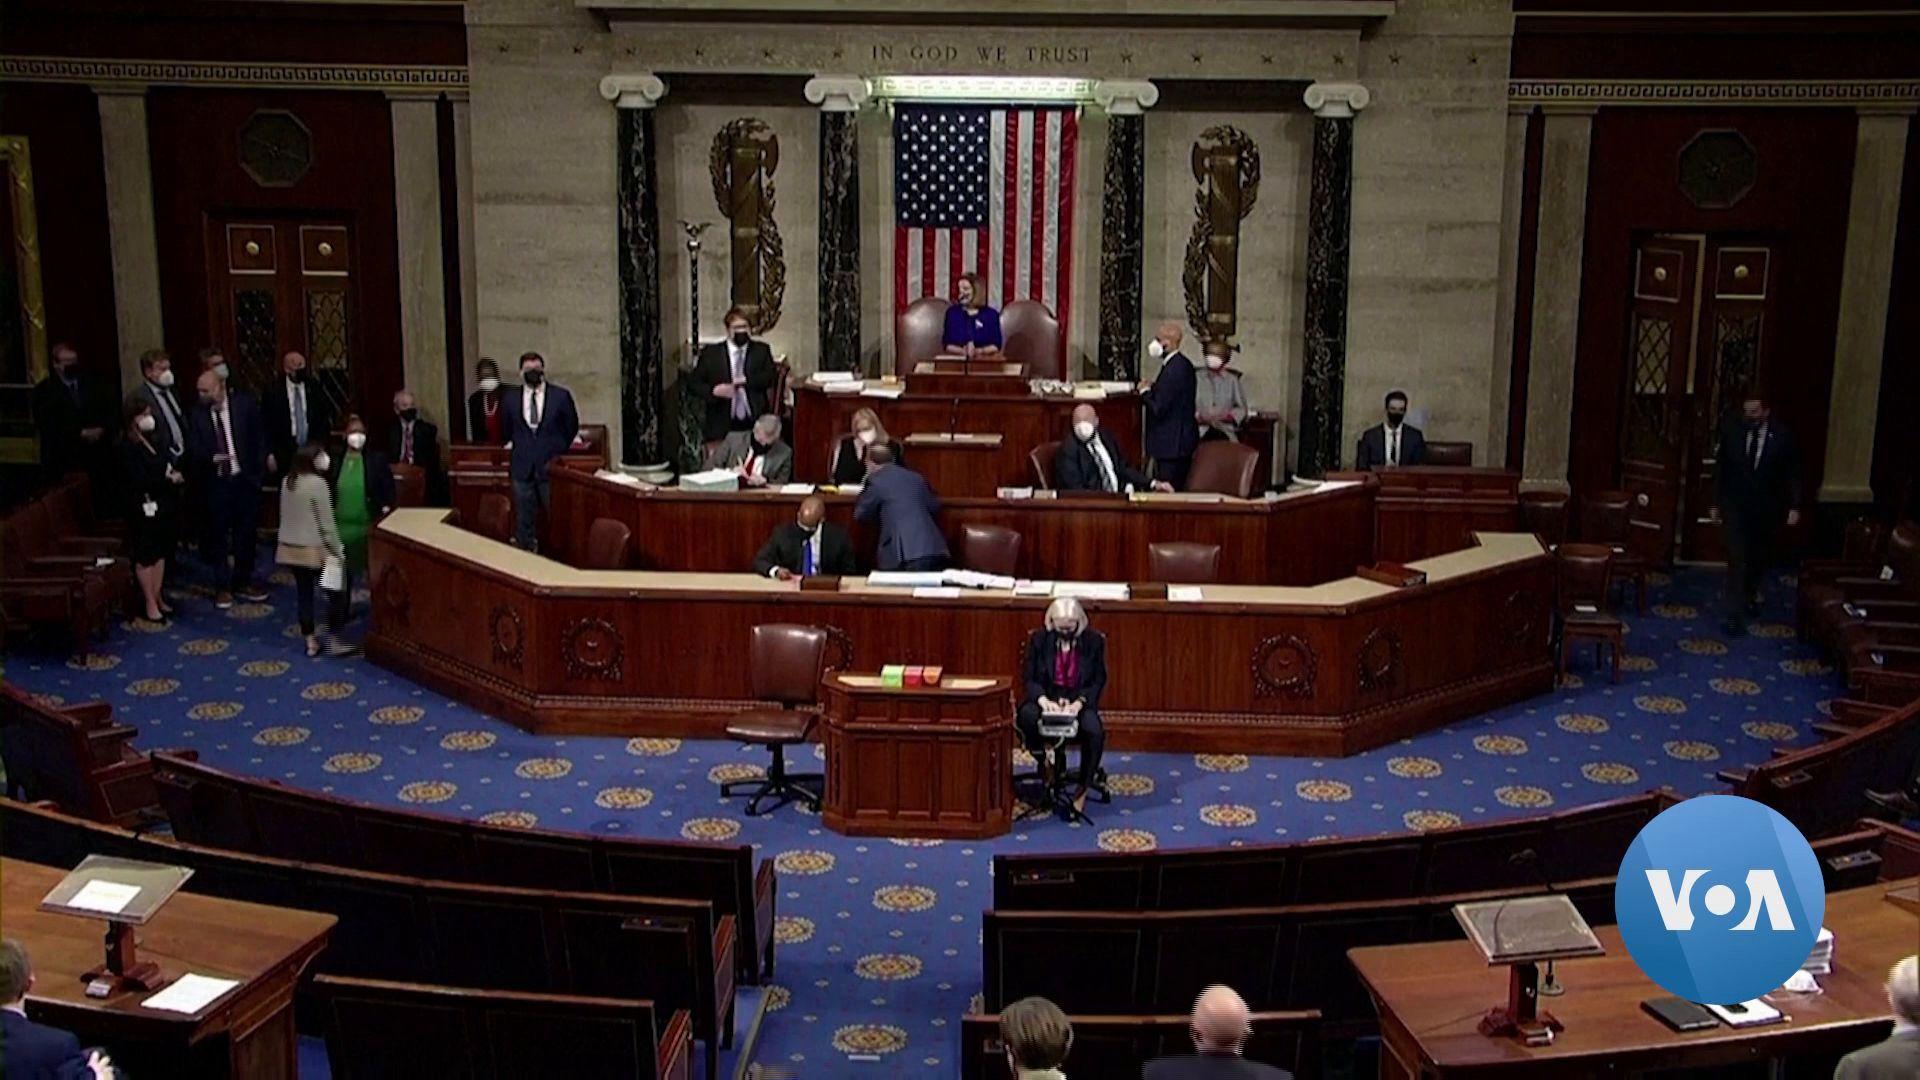 Confrontation in Congress Raises Civility Concerns